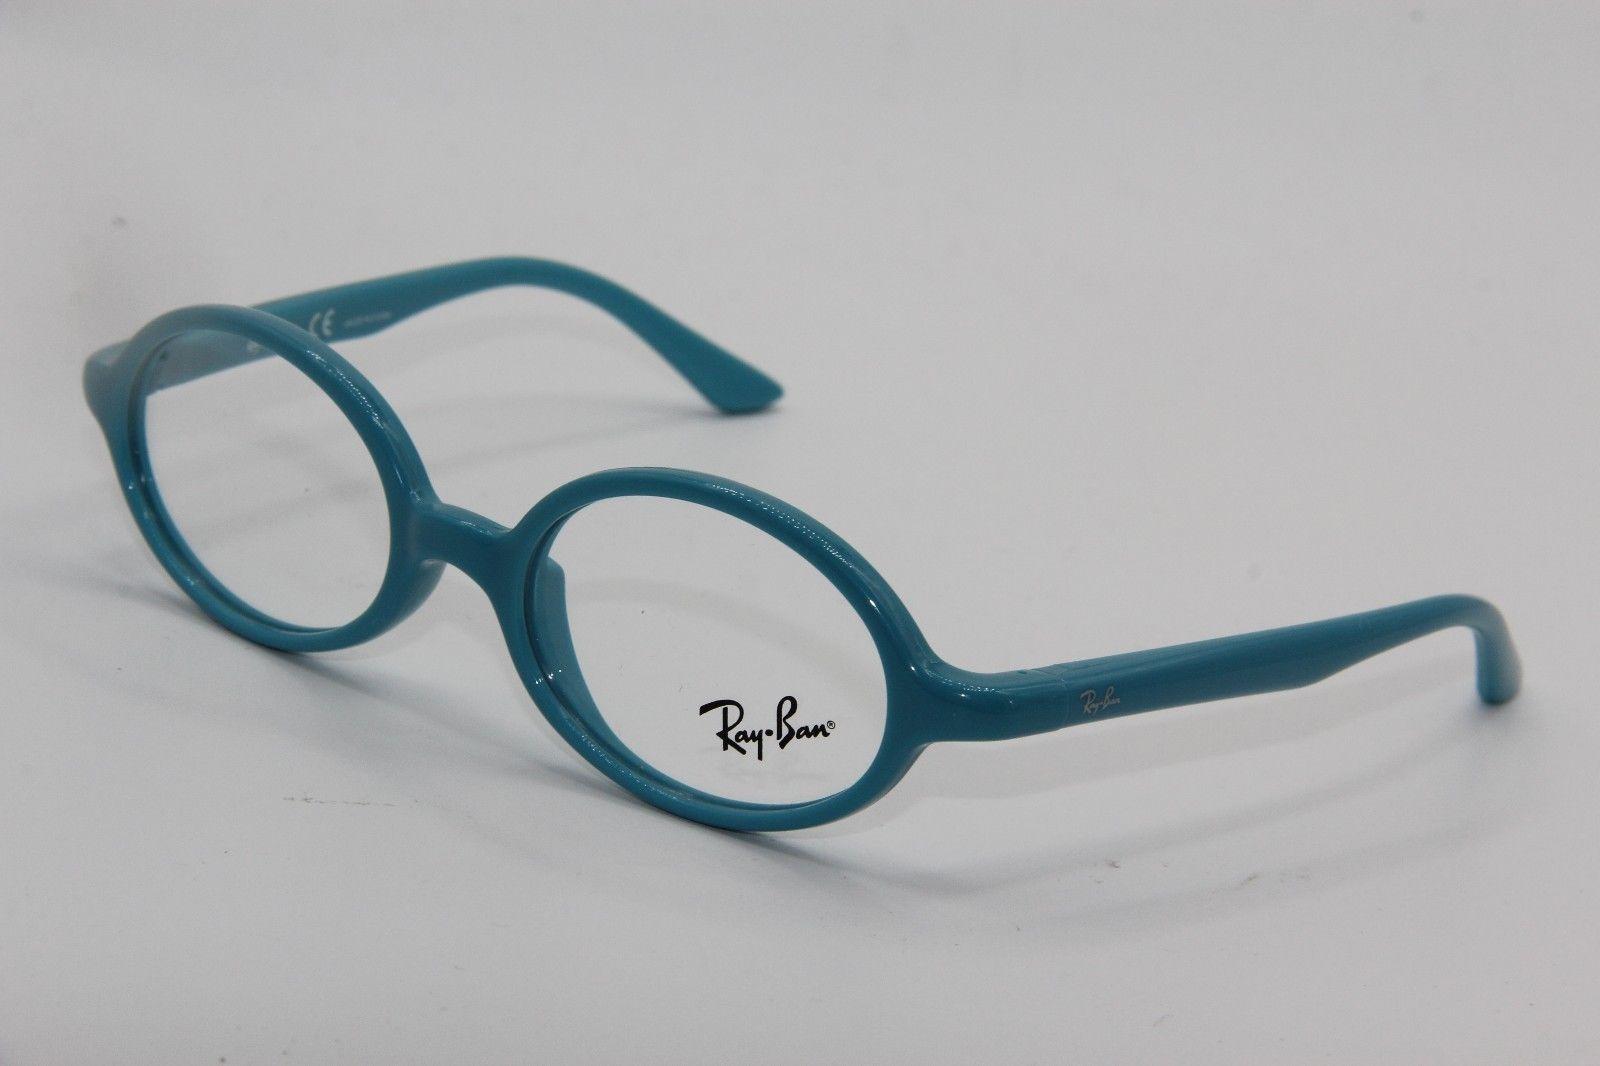 b9e6fae2ee New RAY-BAN Jr Rb 1545 3637 Blue Eyeglasses and 50 similar items. 57